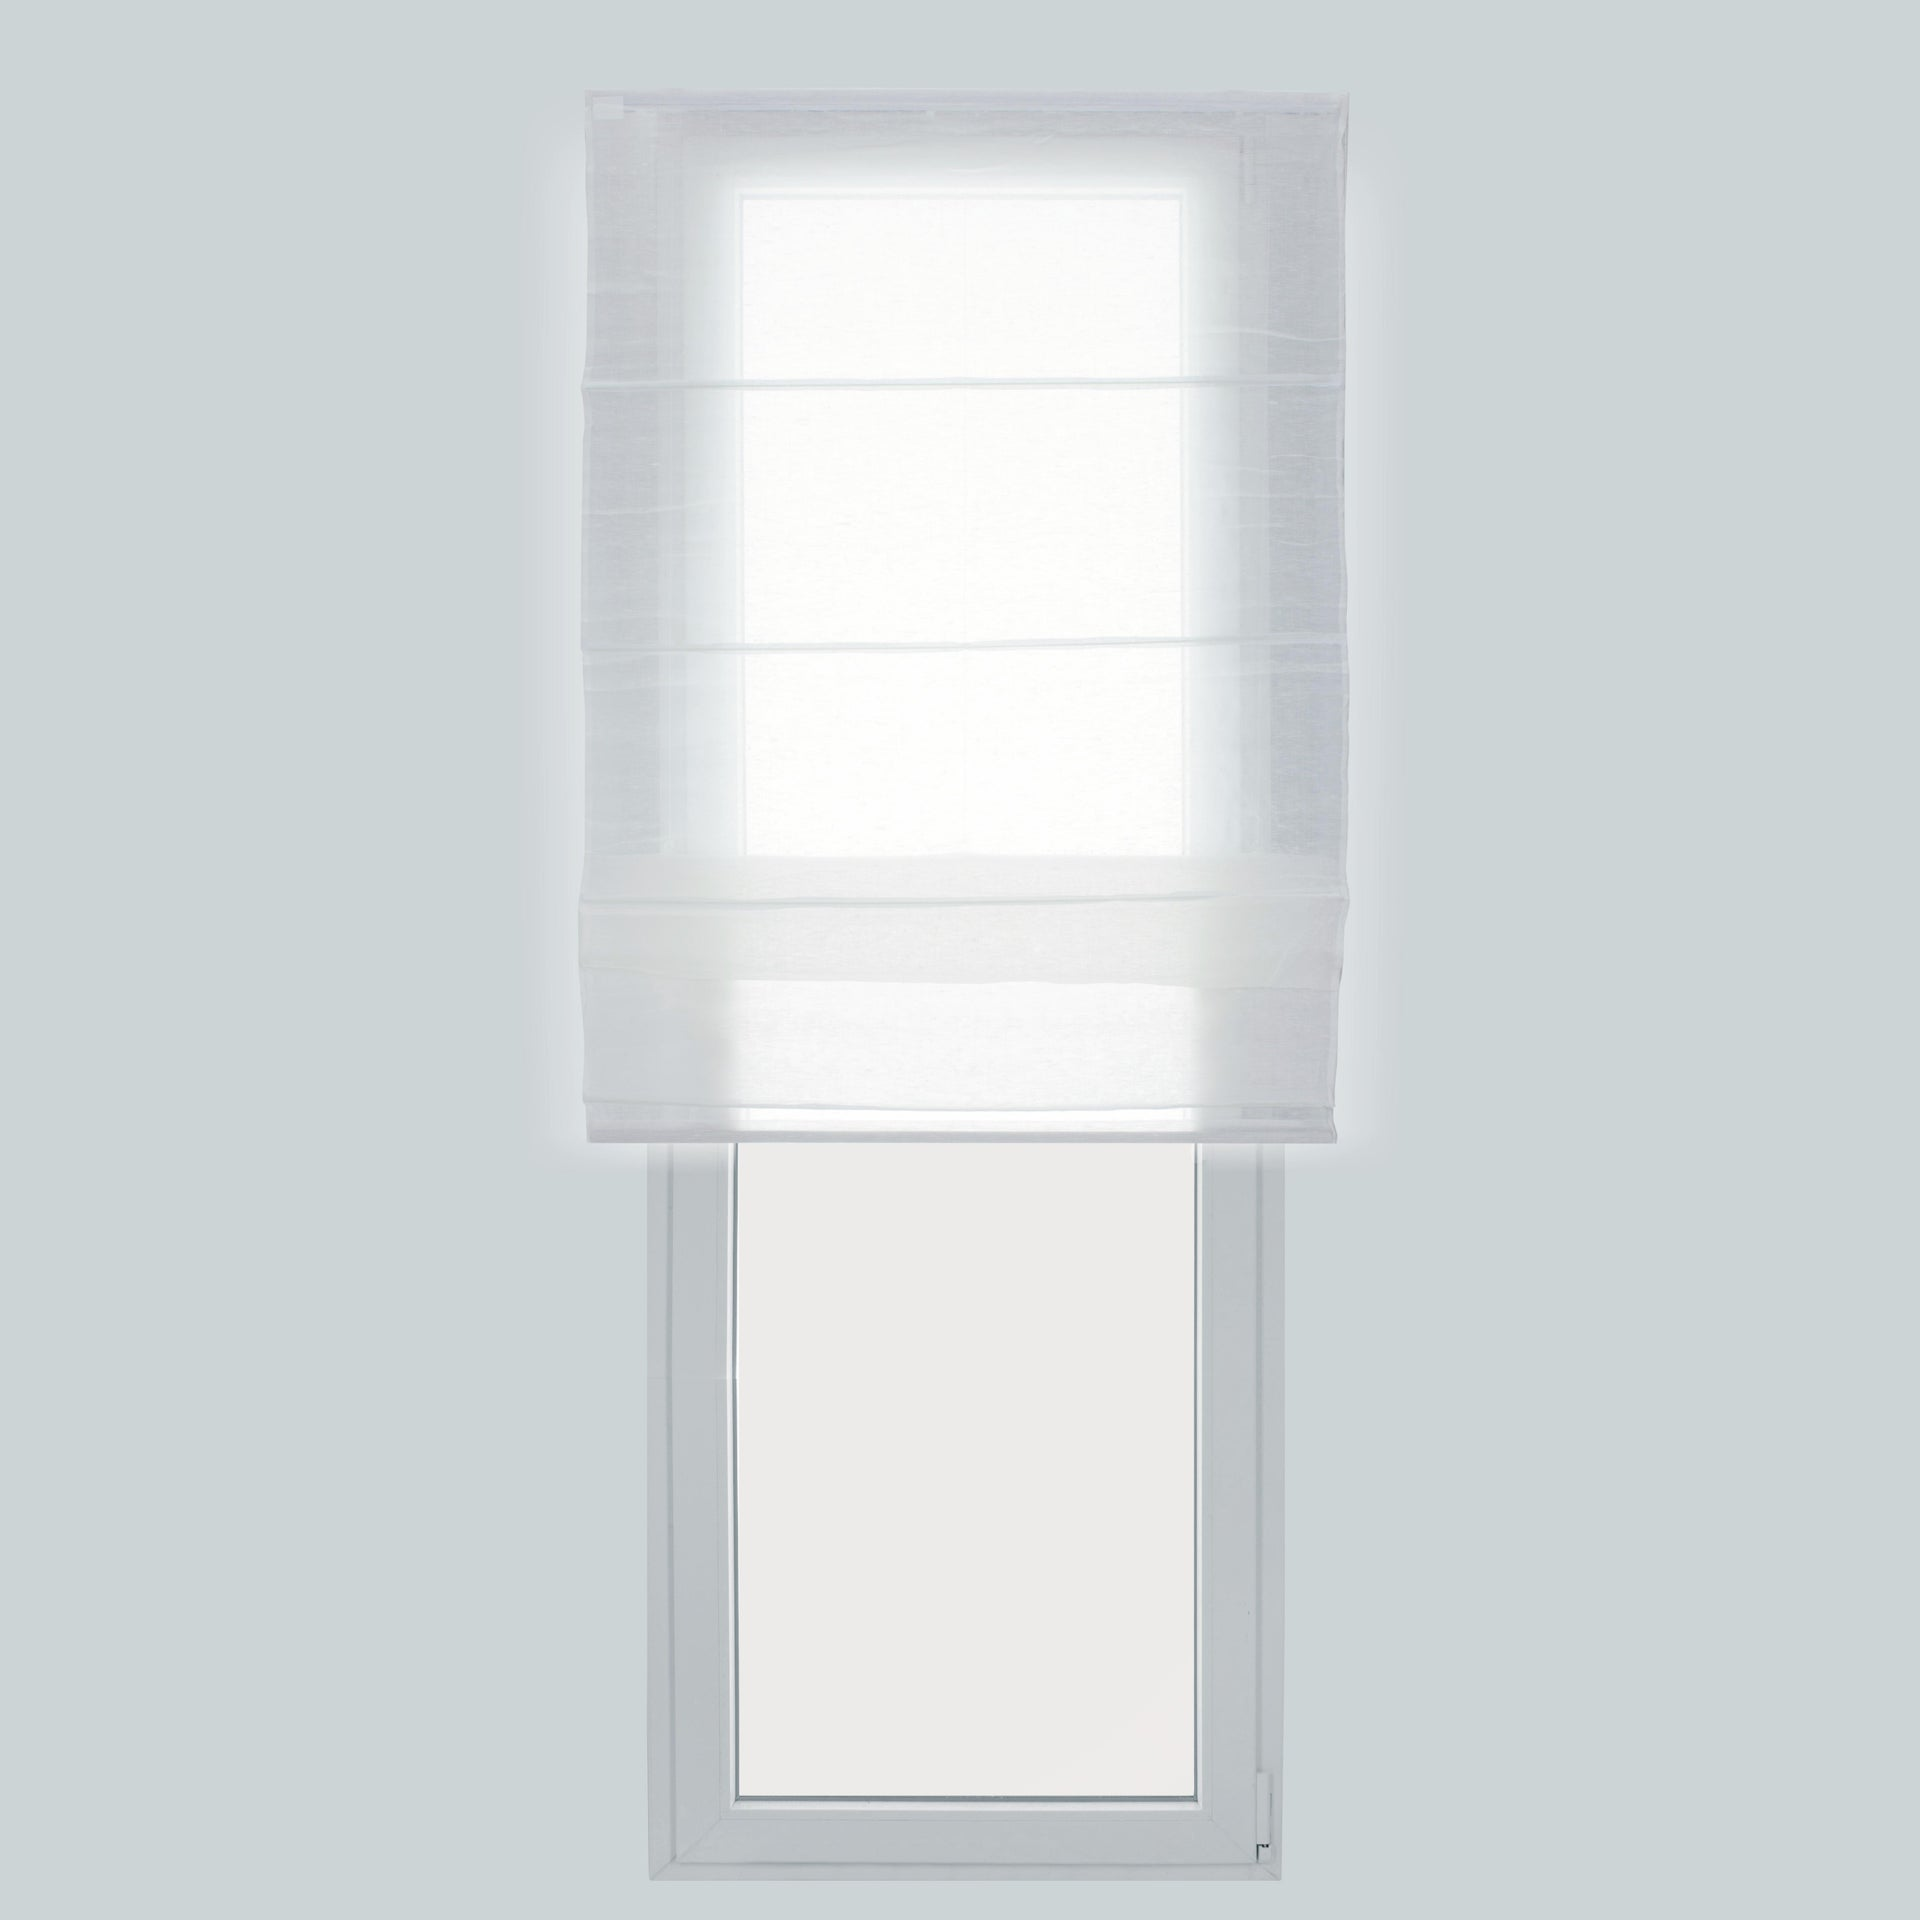 Tenda a pacchetto INSPIRE Elfi bianco 120x250 cm - 4